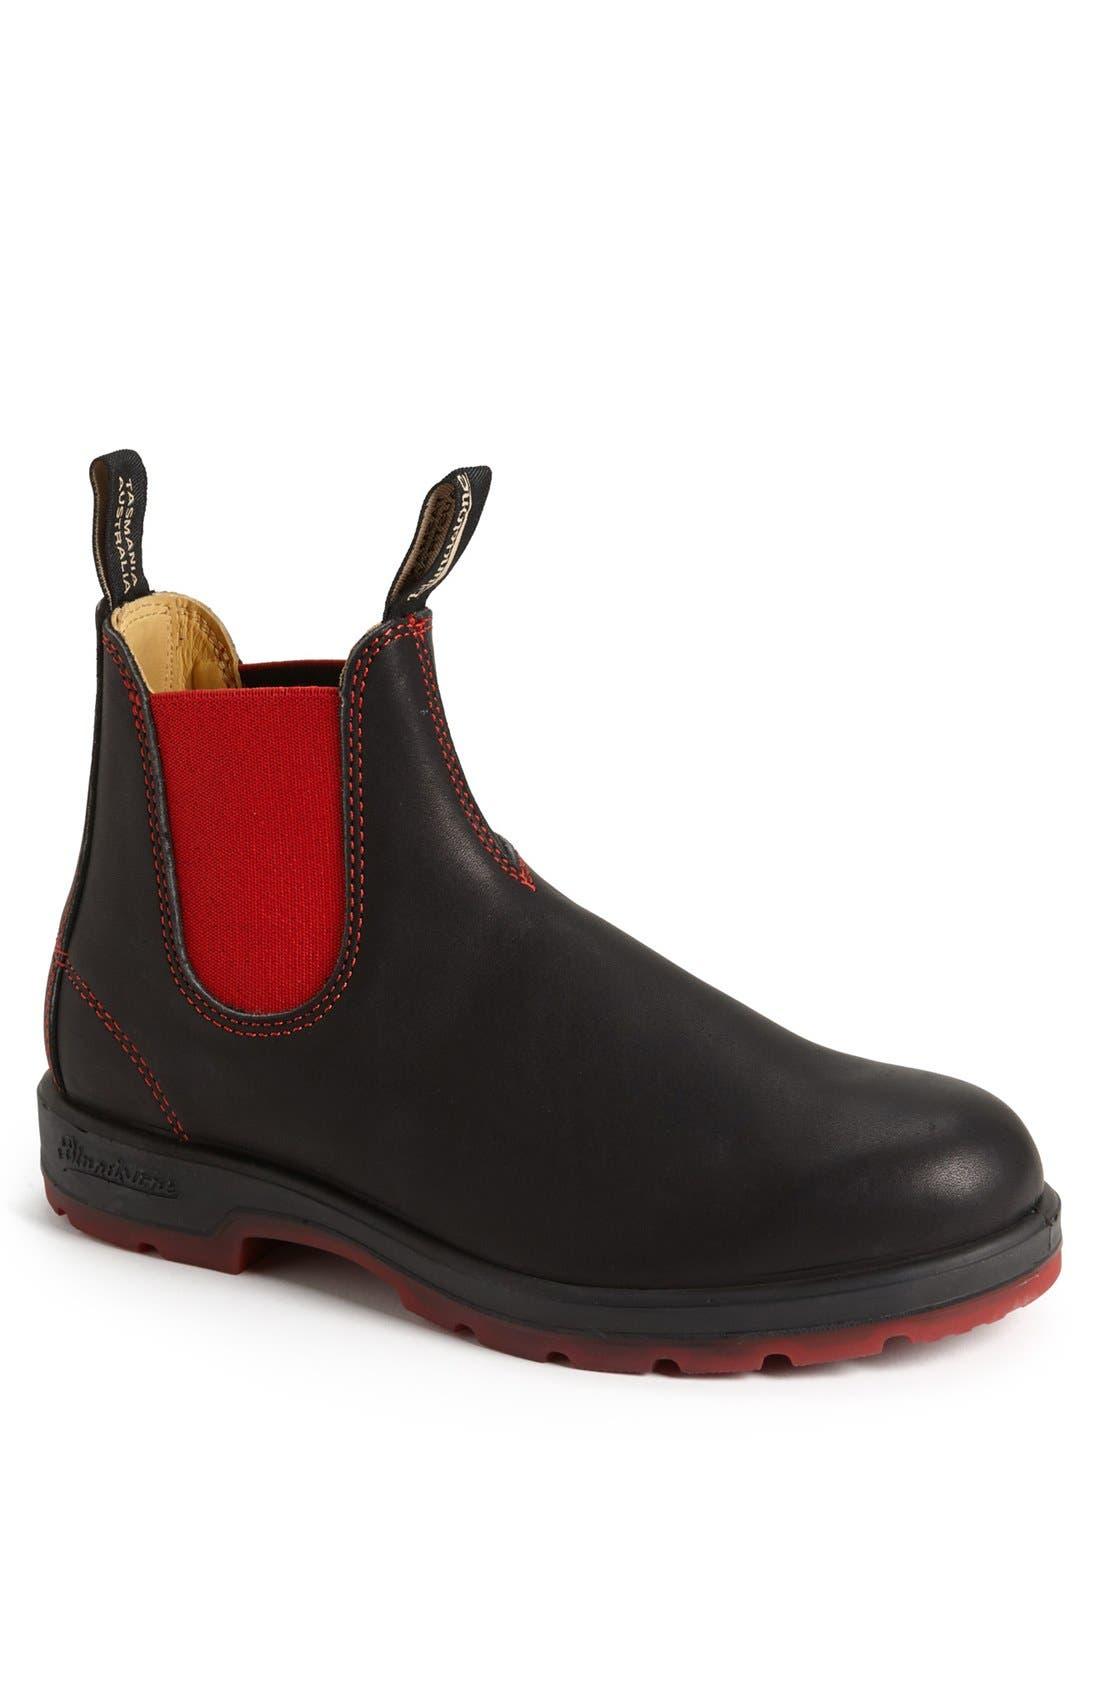 Main Image - Blundstone Footwear Chelsea Boot (Men)